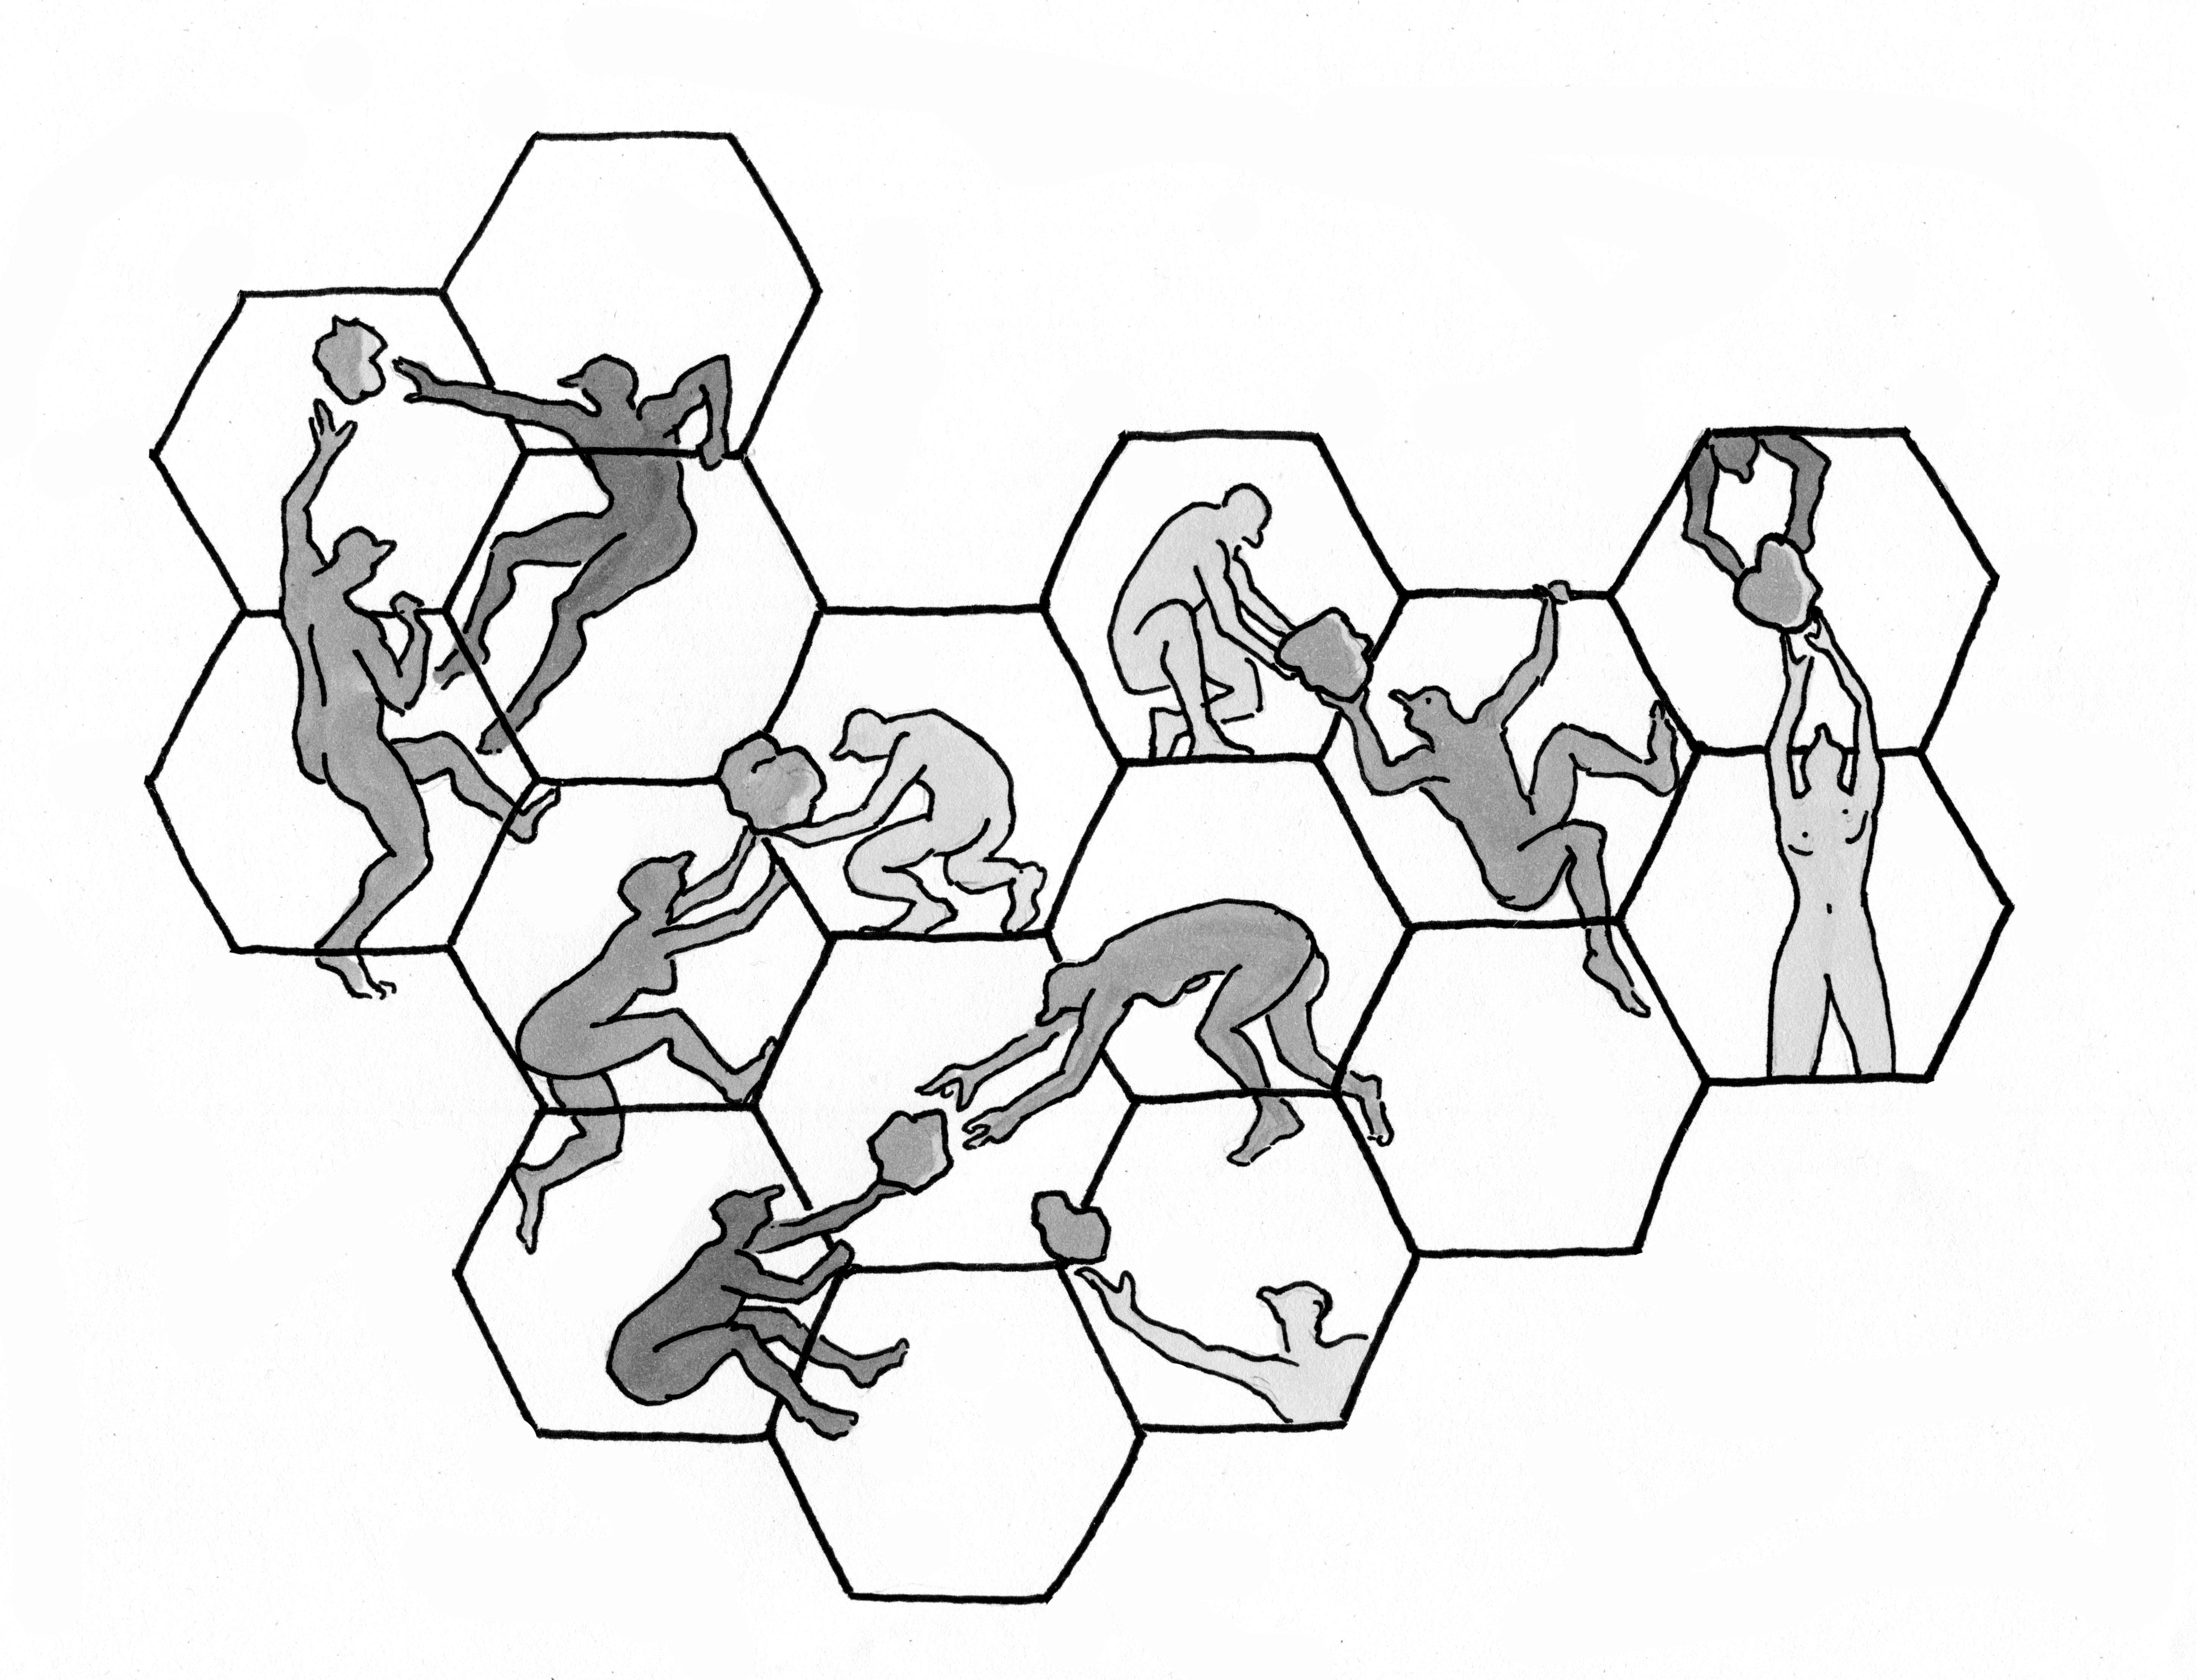 The Human Social Organism and a Parliament of Genes